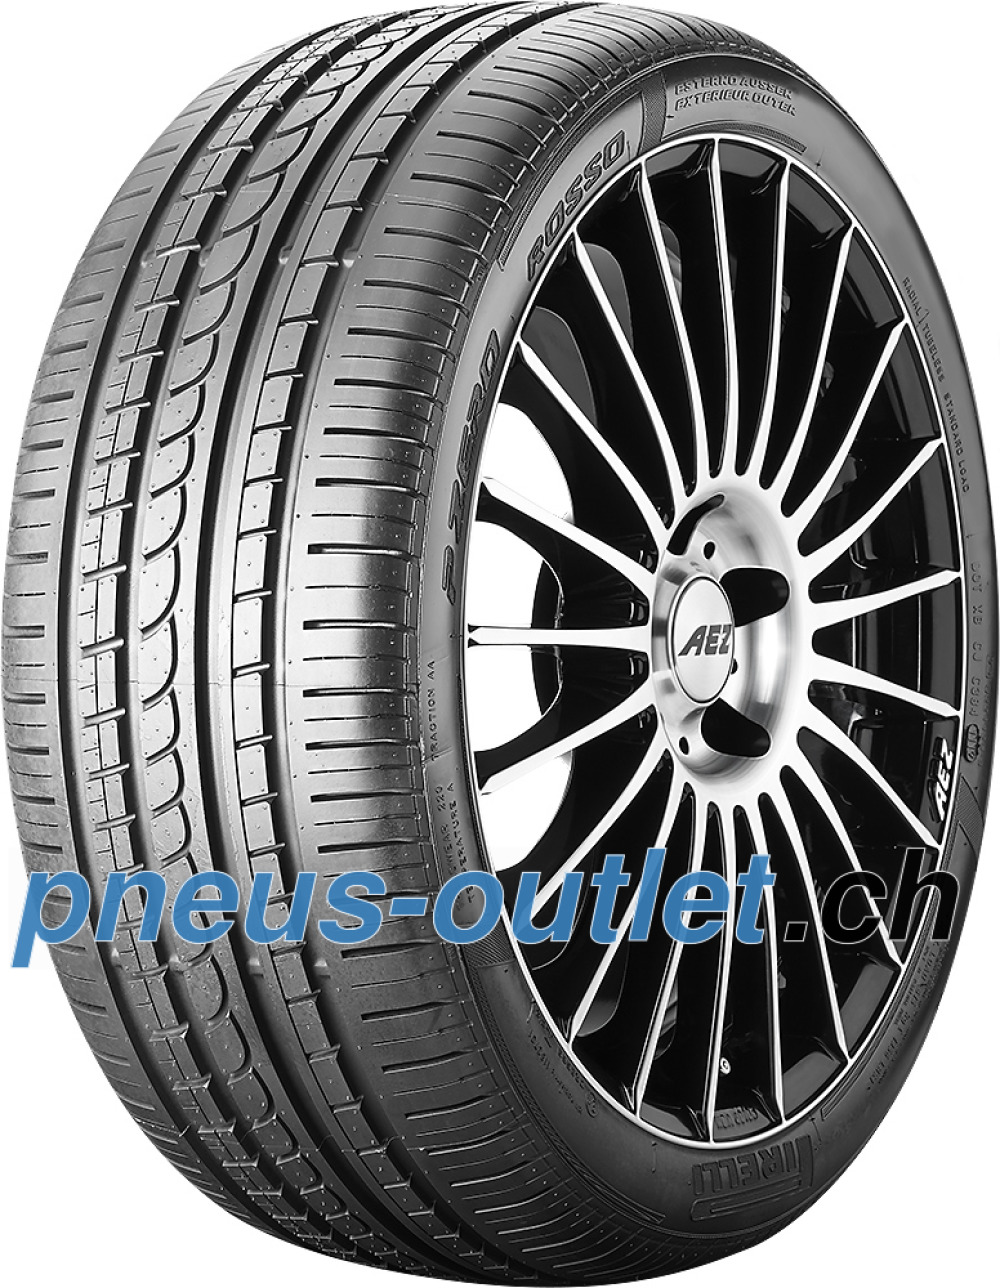 Pirelli P Zero Rosso Asimmetrico ( 225/50 ZR16 (92Y) N4 )